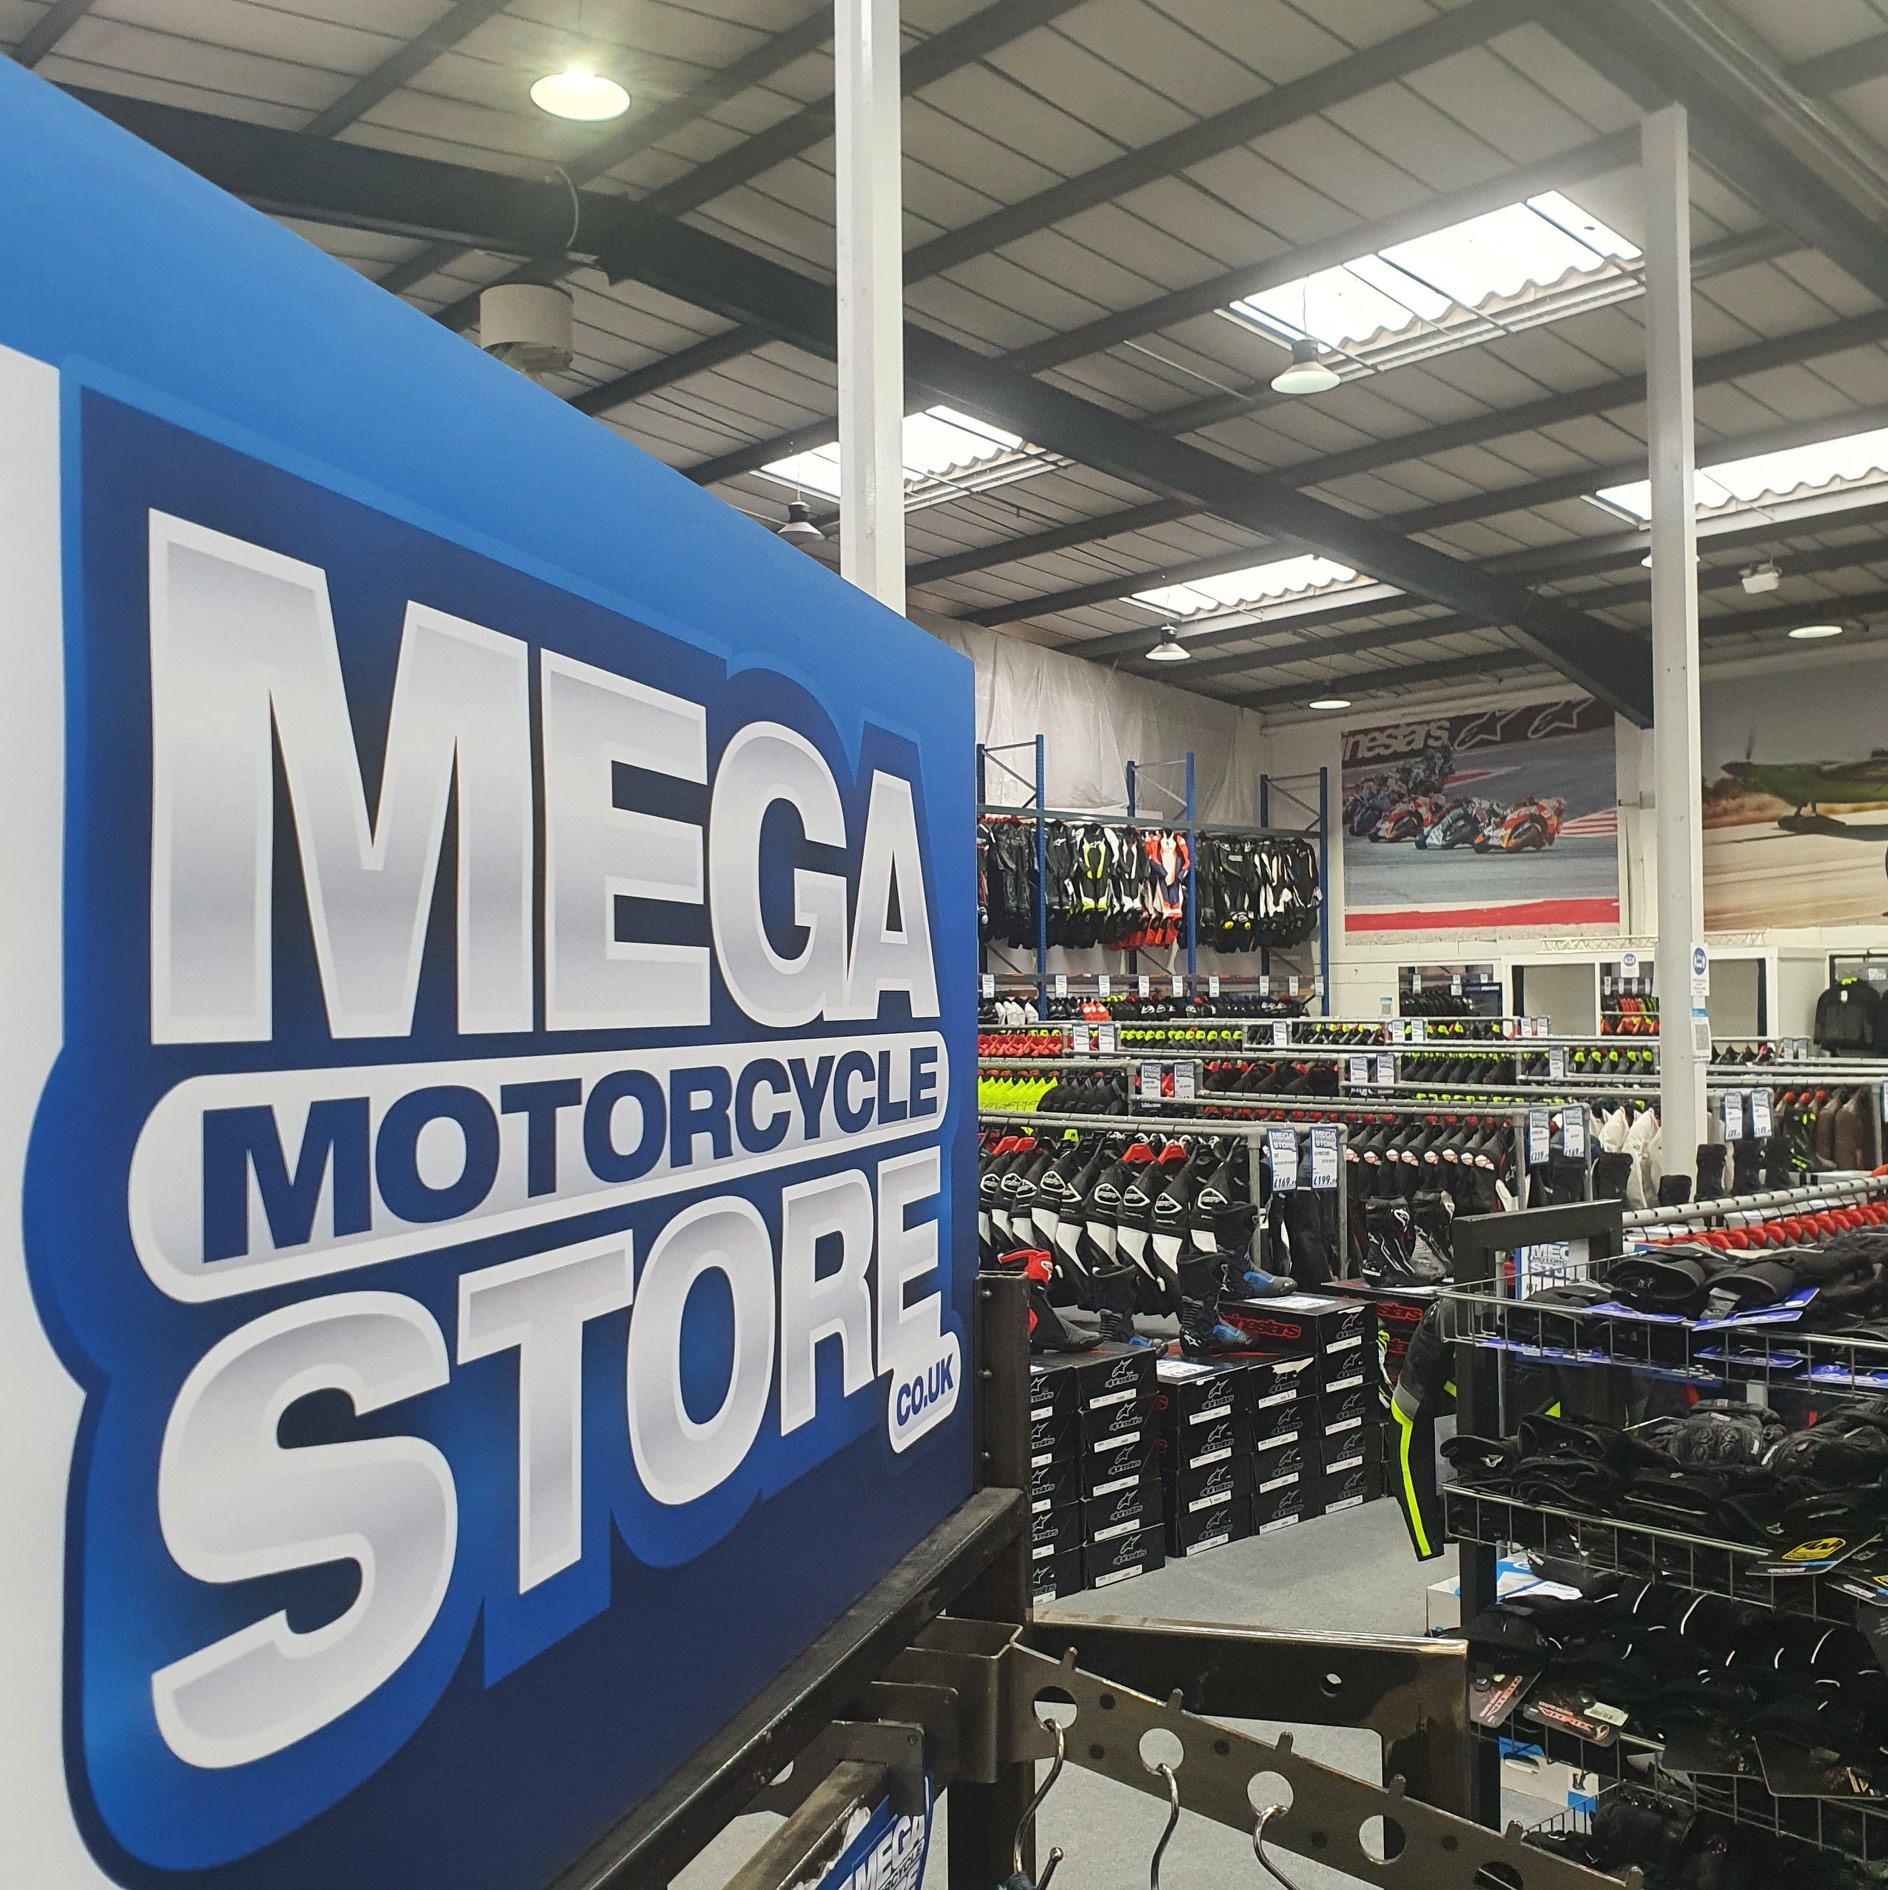 Swindon Motorcycle Megastore